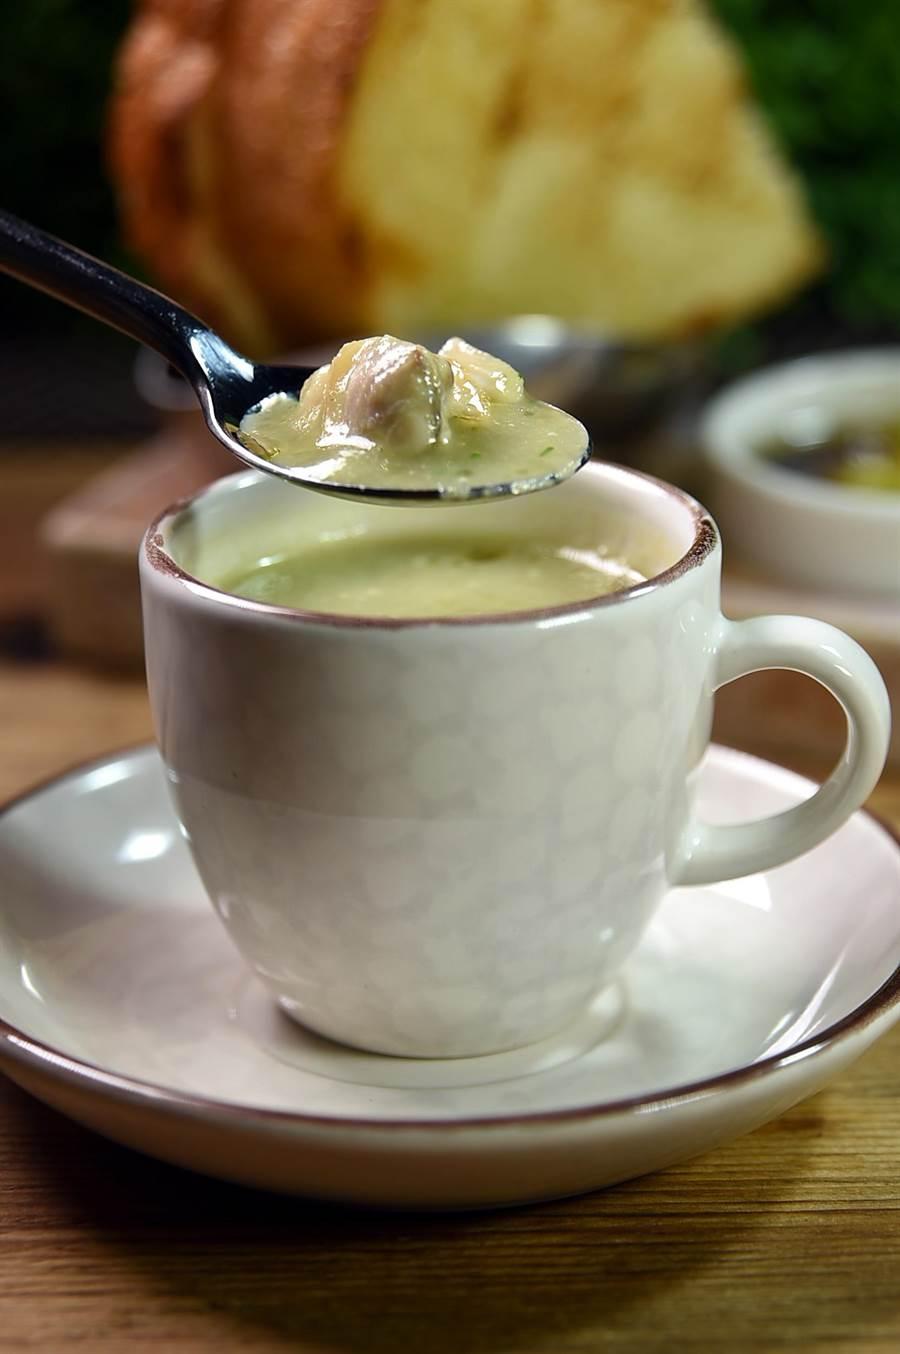 〈 TK SEAFOOD & STEAK〉主廚蔡泰源作的〈蛤蜊絲瓜濃湯〉,是用炒過的絲瓜與洋蔥熬製,湯質濃稠、絲瓜甘甜。蛤蜊清鮮。(圖/姚舜)